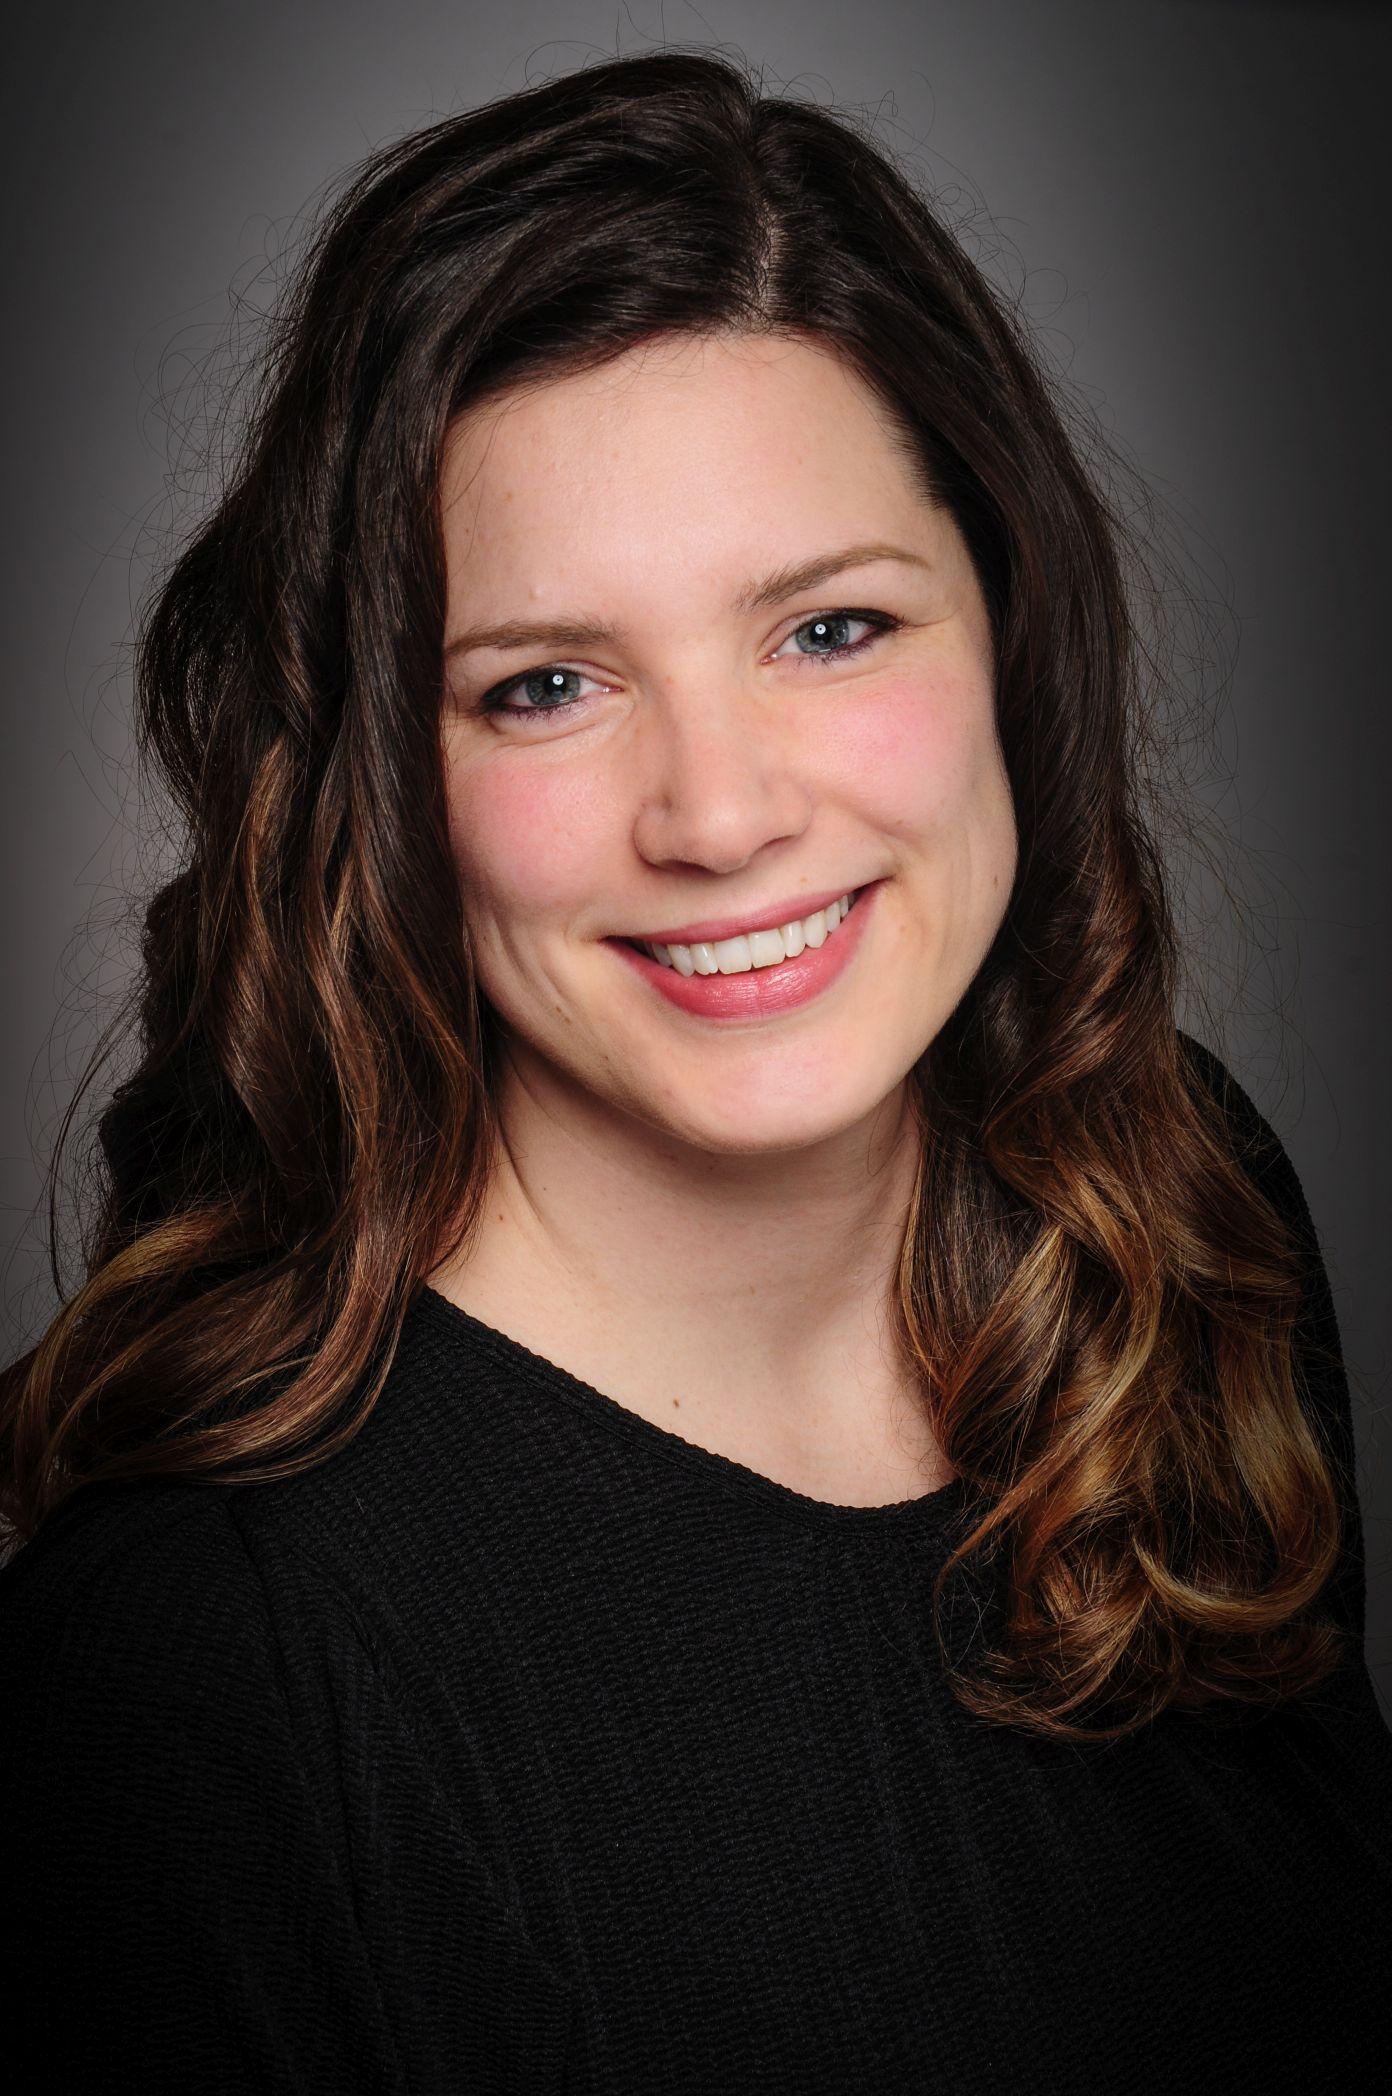 Annemarie Drabinski